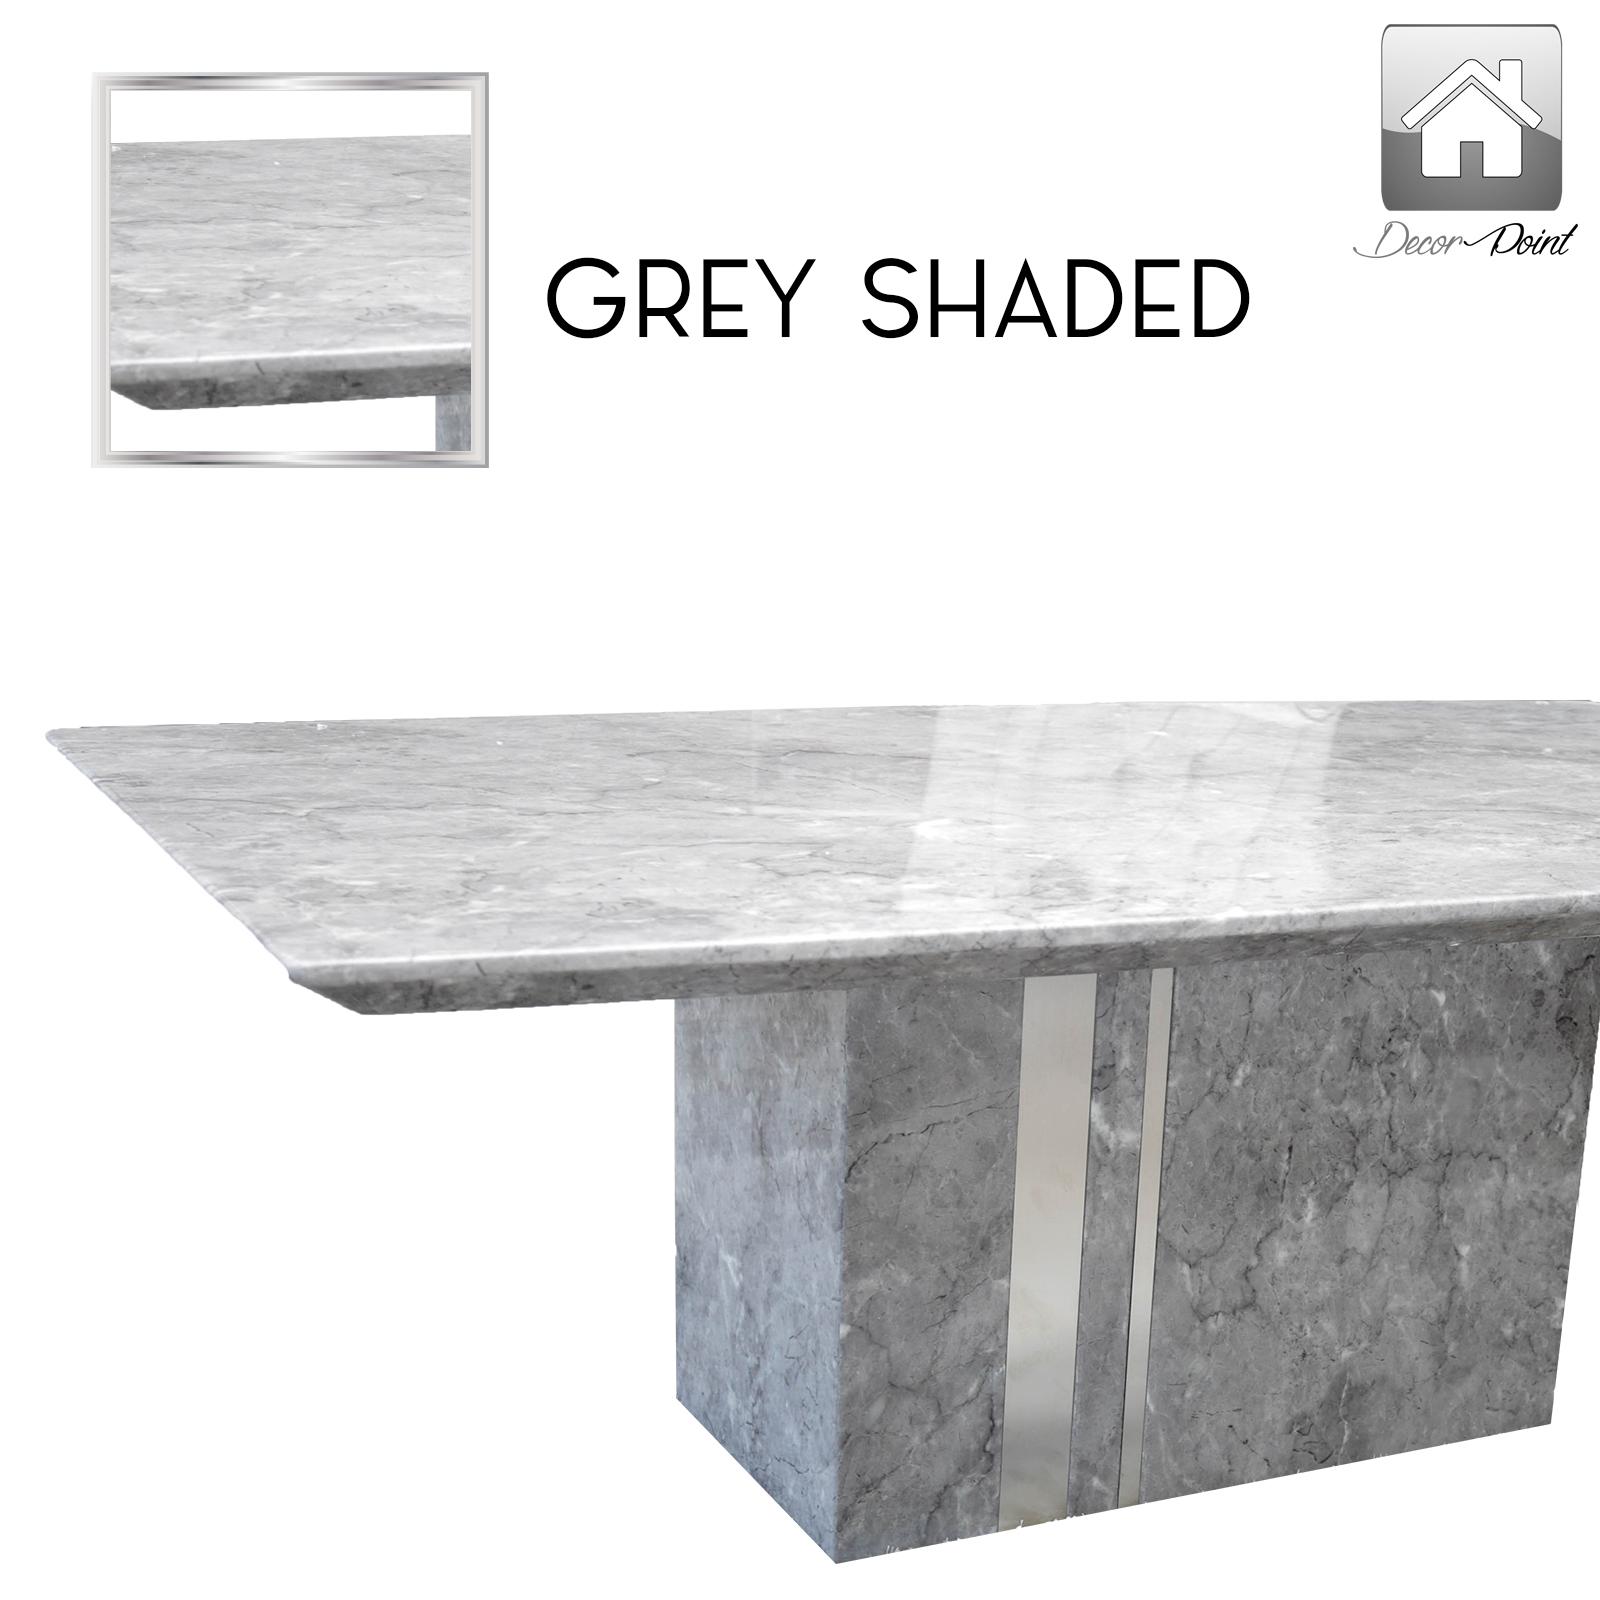 Marble Coffee Table Ebay: New Luxurious Grey Shaded High Gloss Marble Veneer Coffee